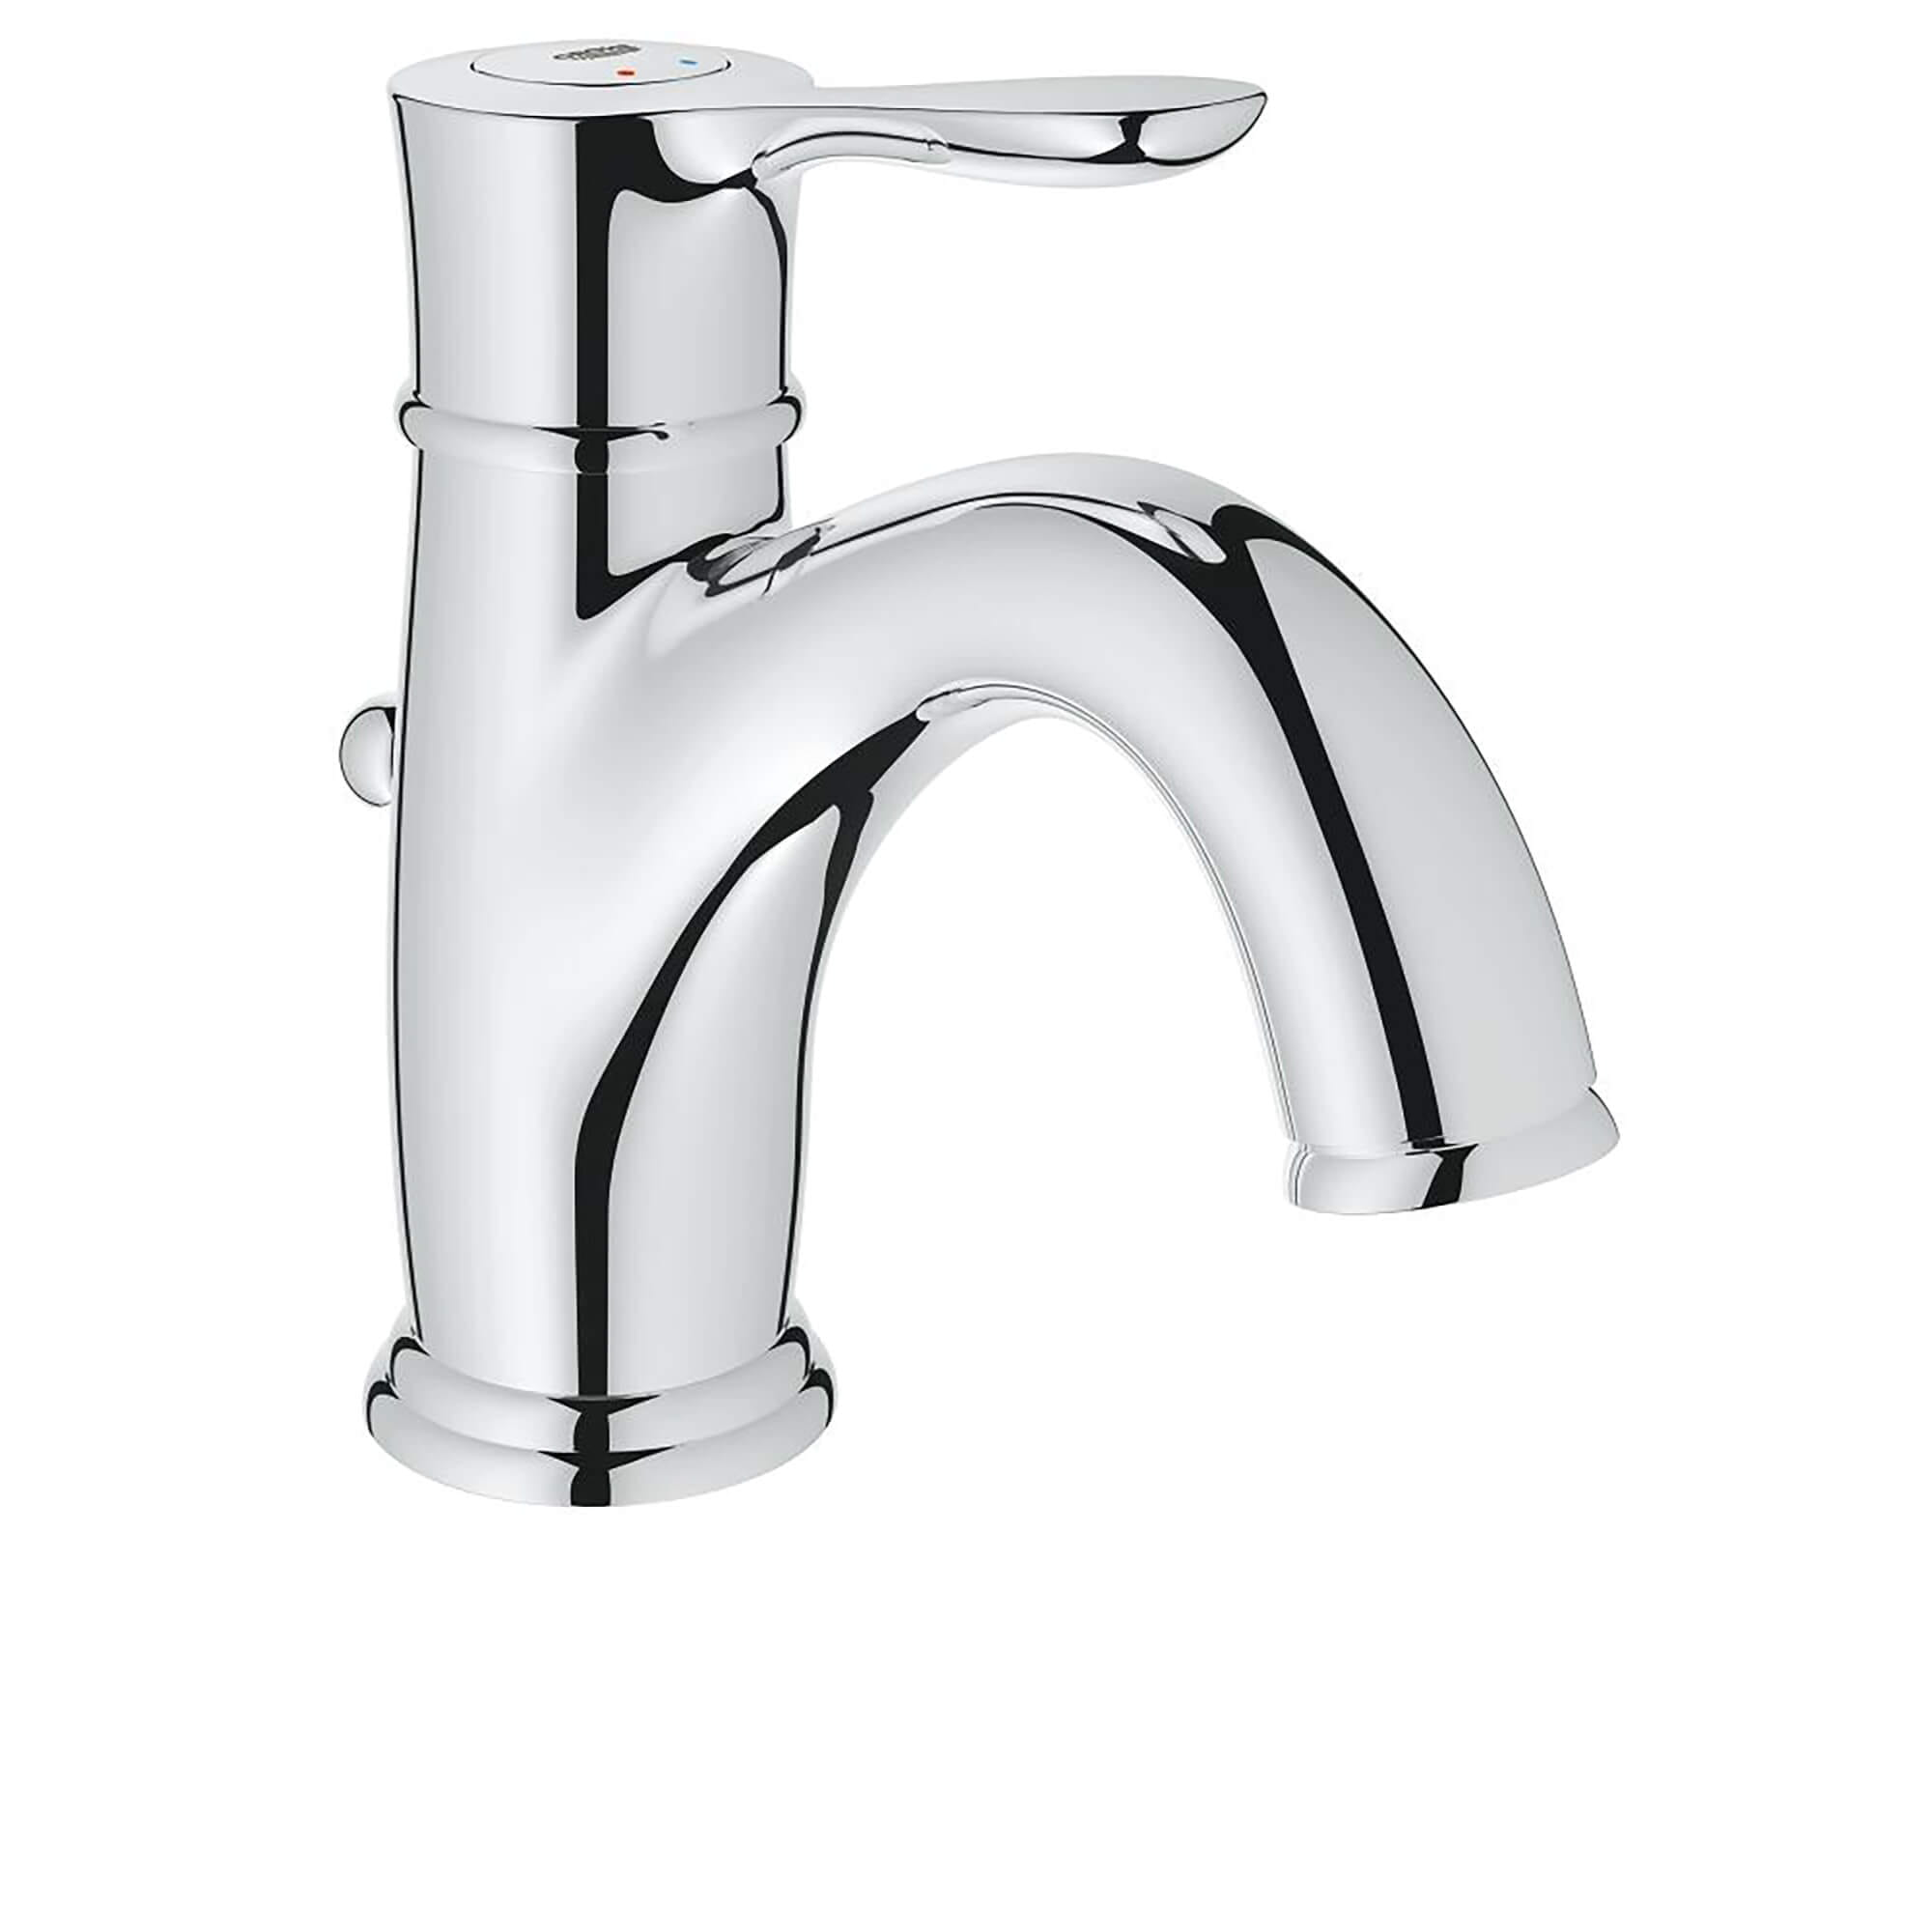 centerset single handle single hole bathroom faucet 1 2 gpm